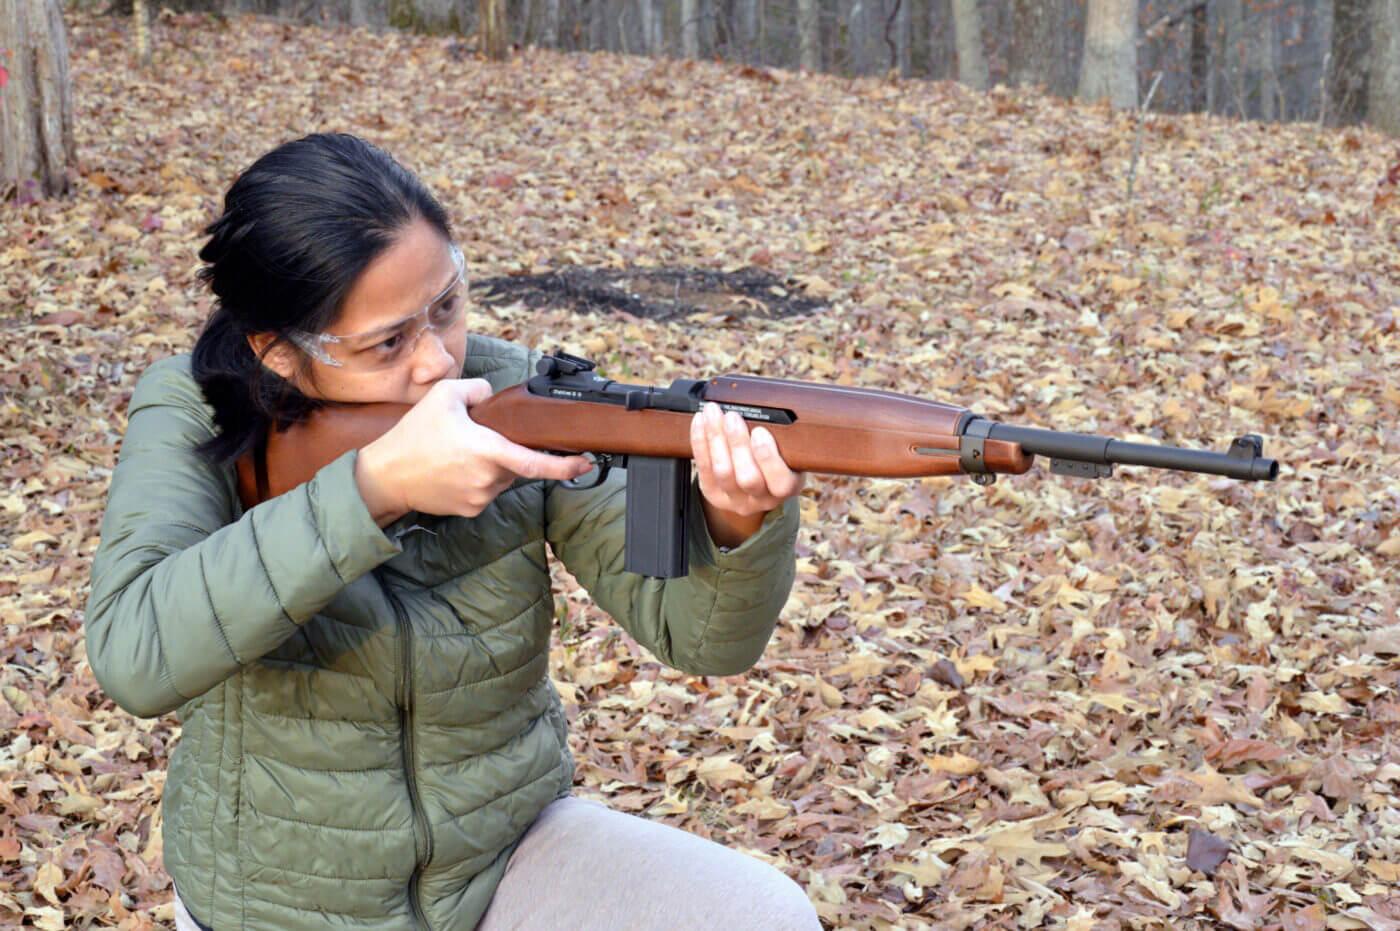 Springfield Armory M1 Carbine BB gun testing